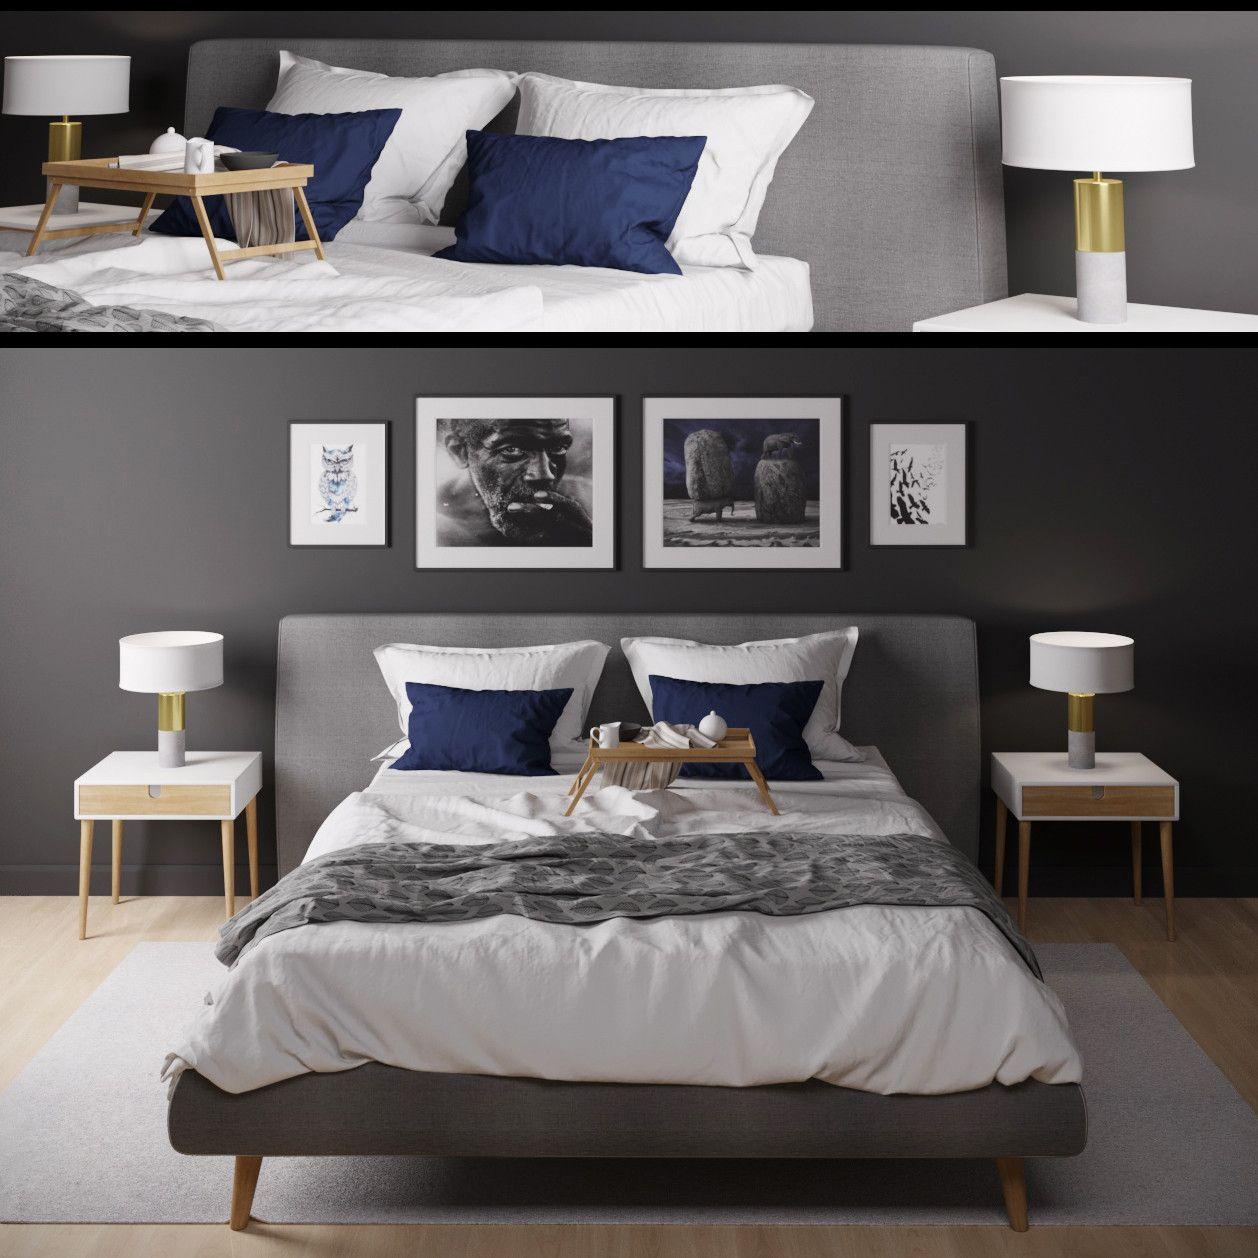 Bed pillow pictures d model d model dmodeling pinterest